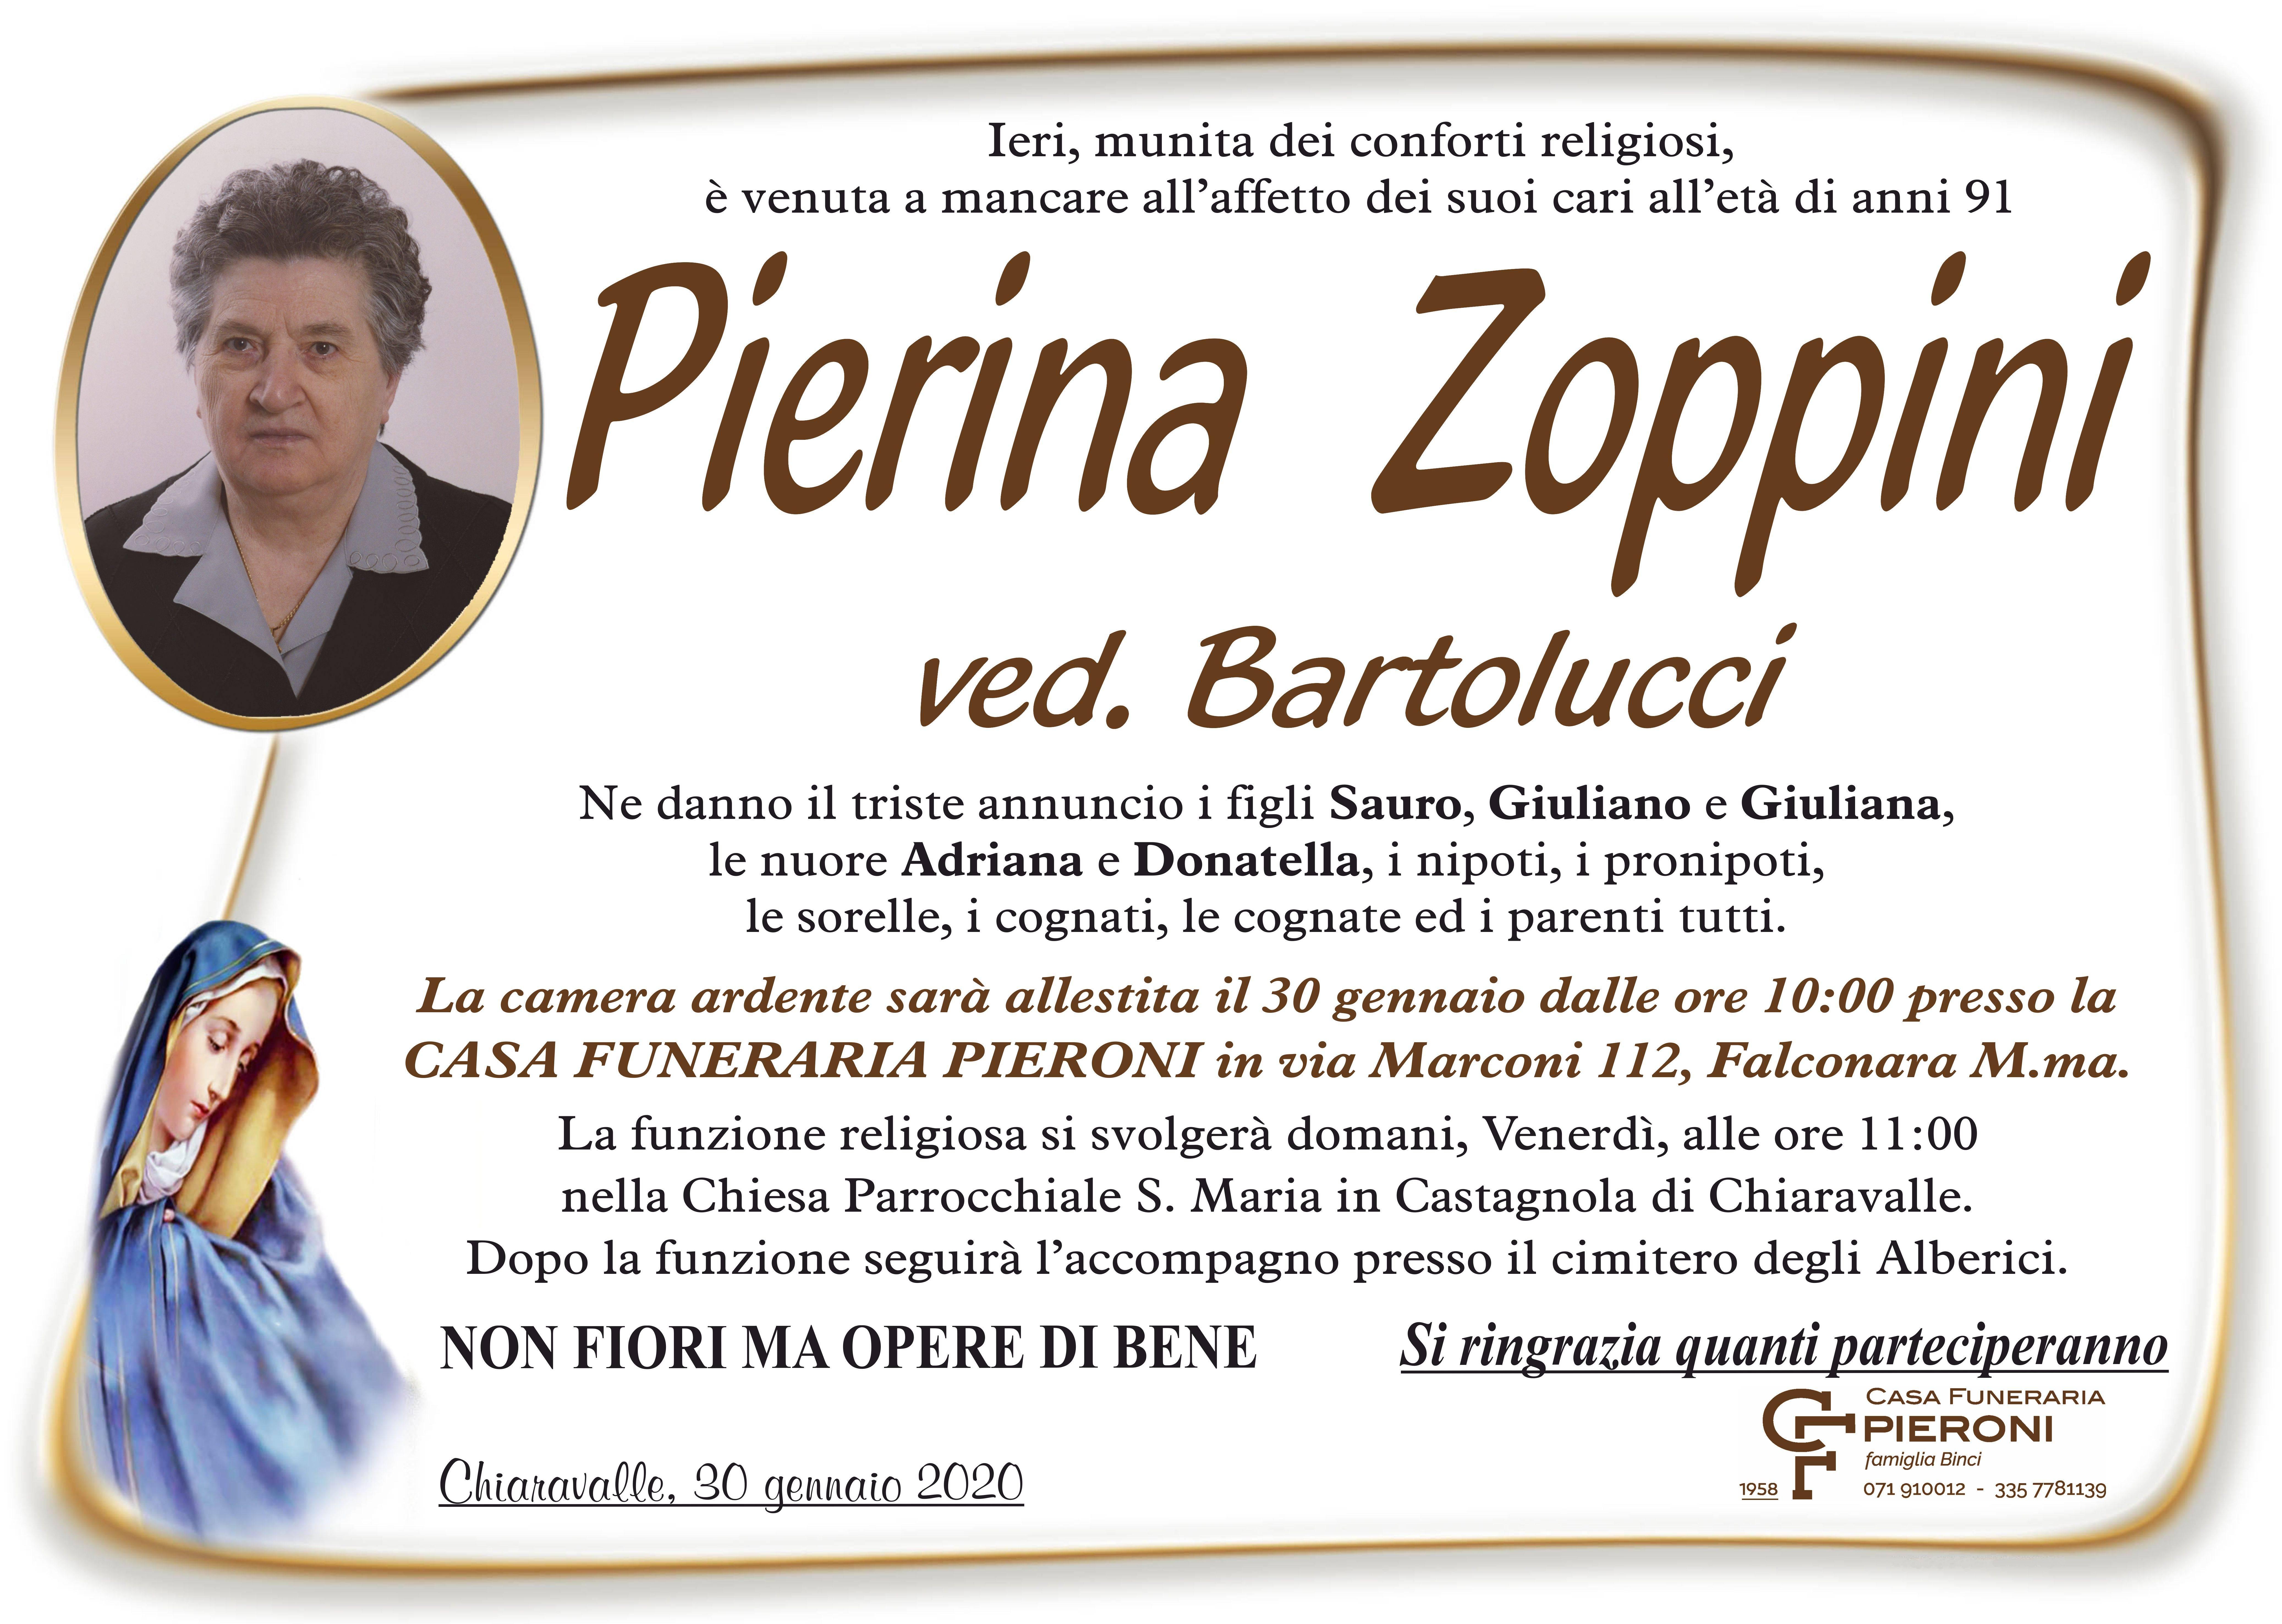 Pierina Zoppini